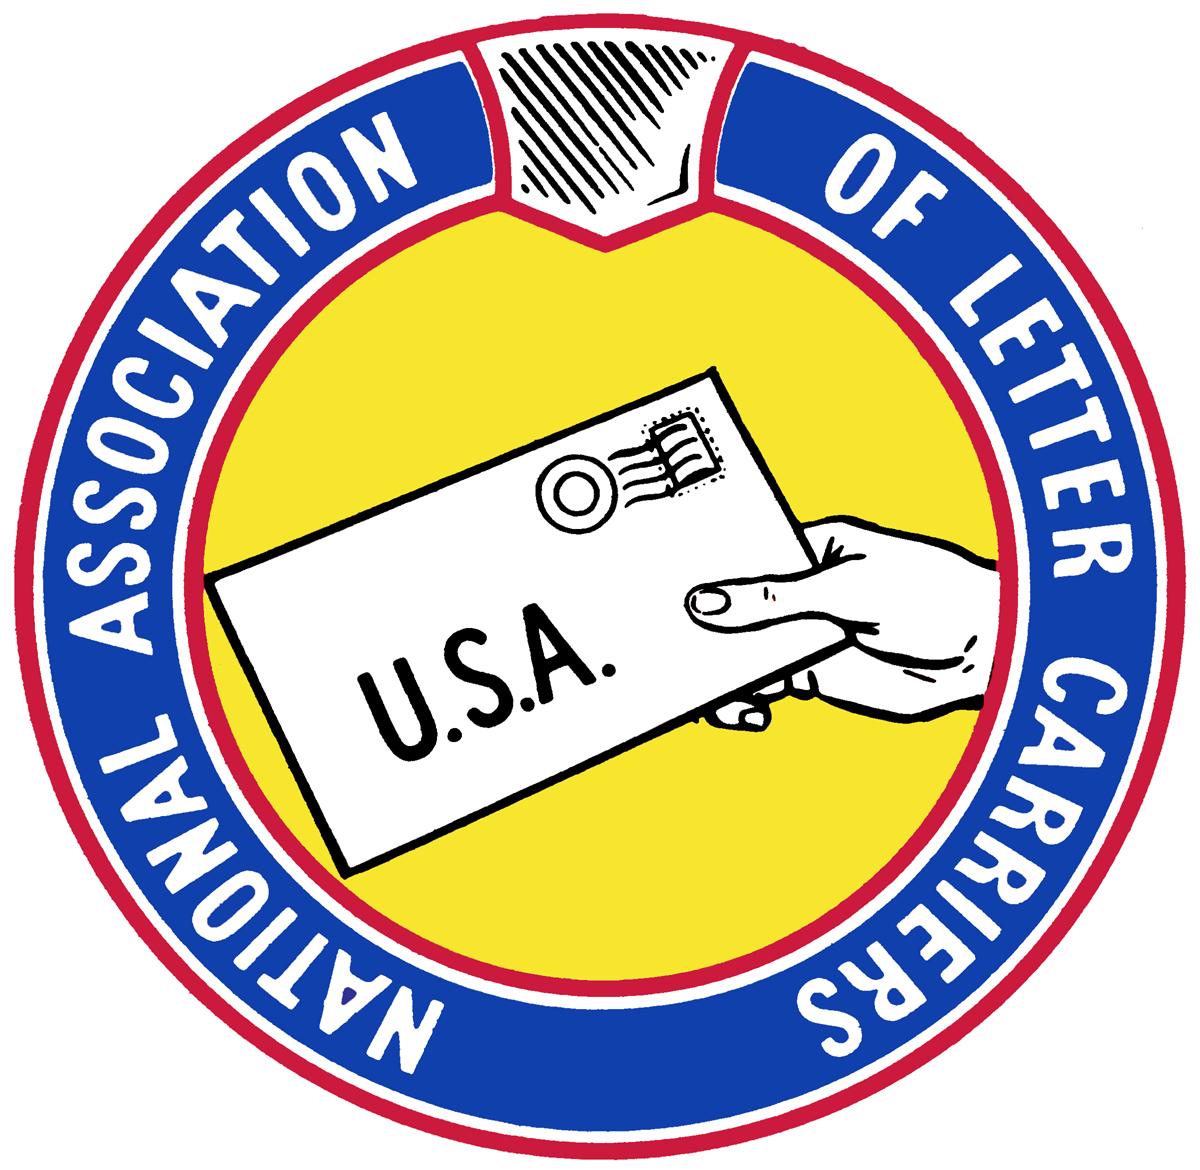 nalc logo color jpg